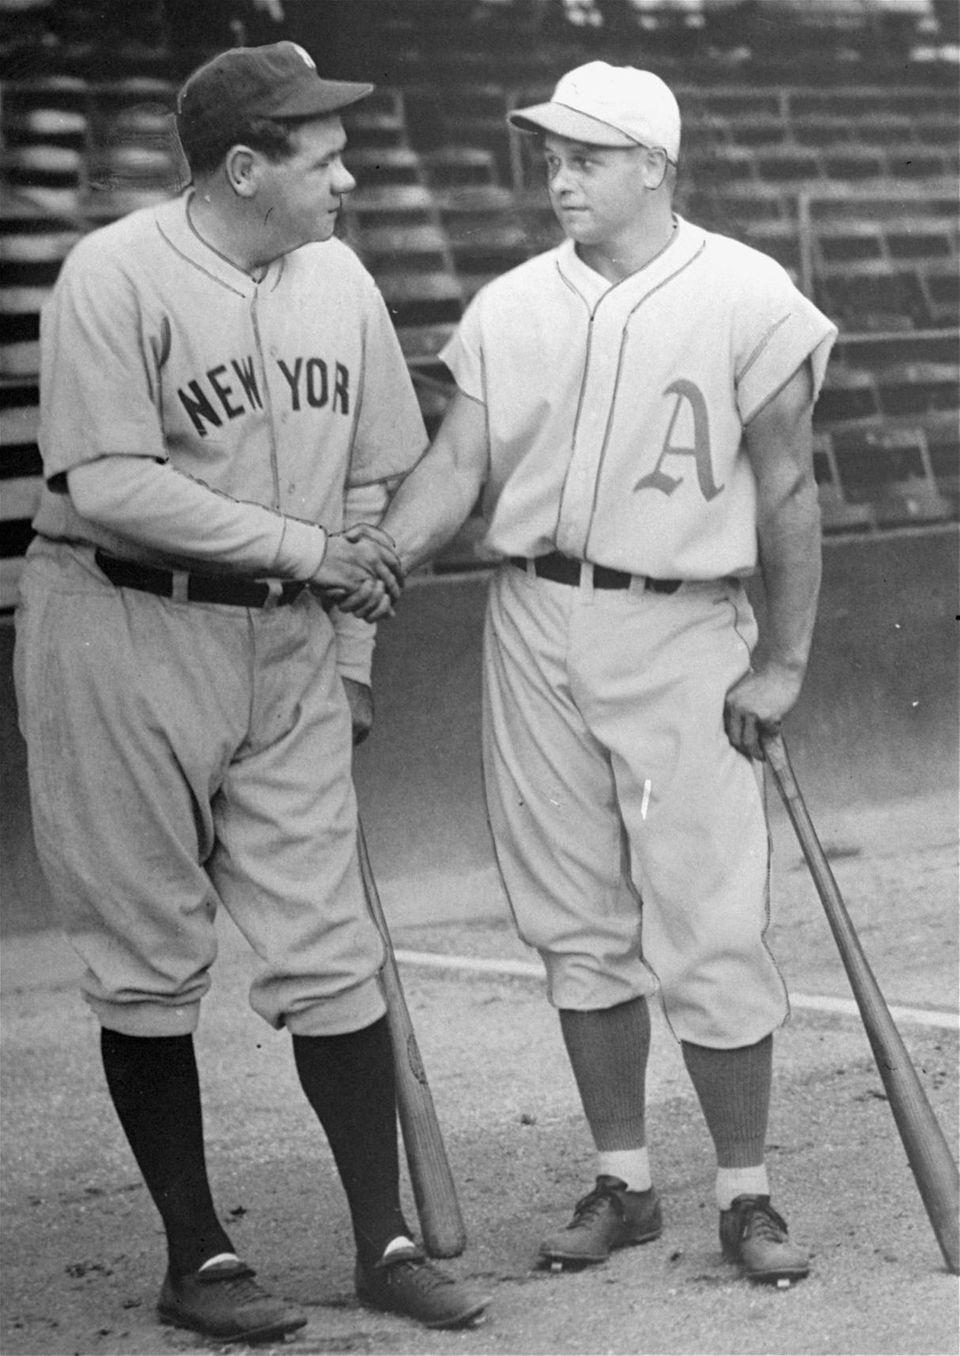 JIMMIE FOXX 1932, Philadelphia Athletics 58 home runs